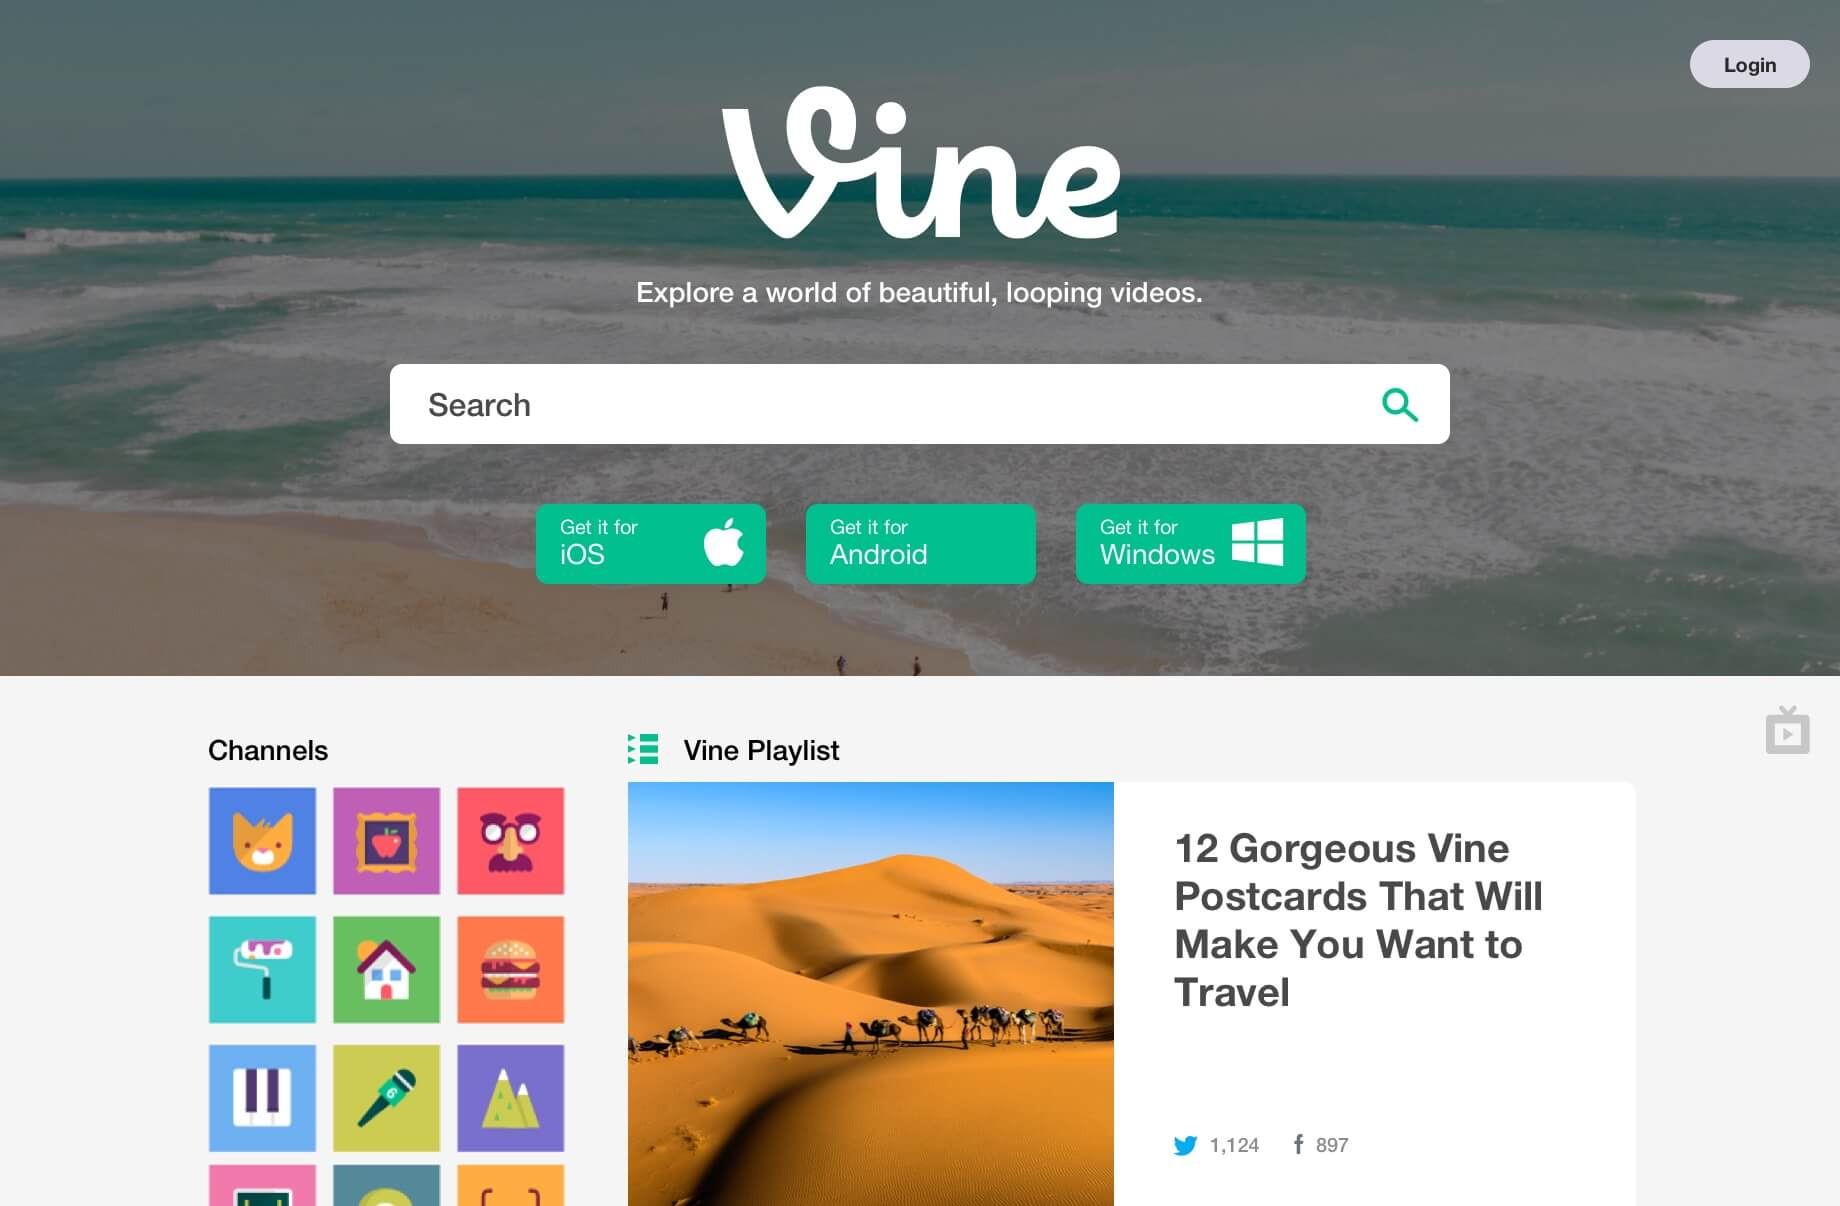 Vine.co home page